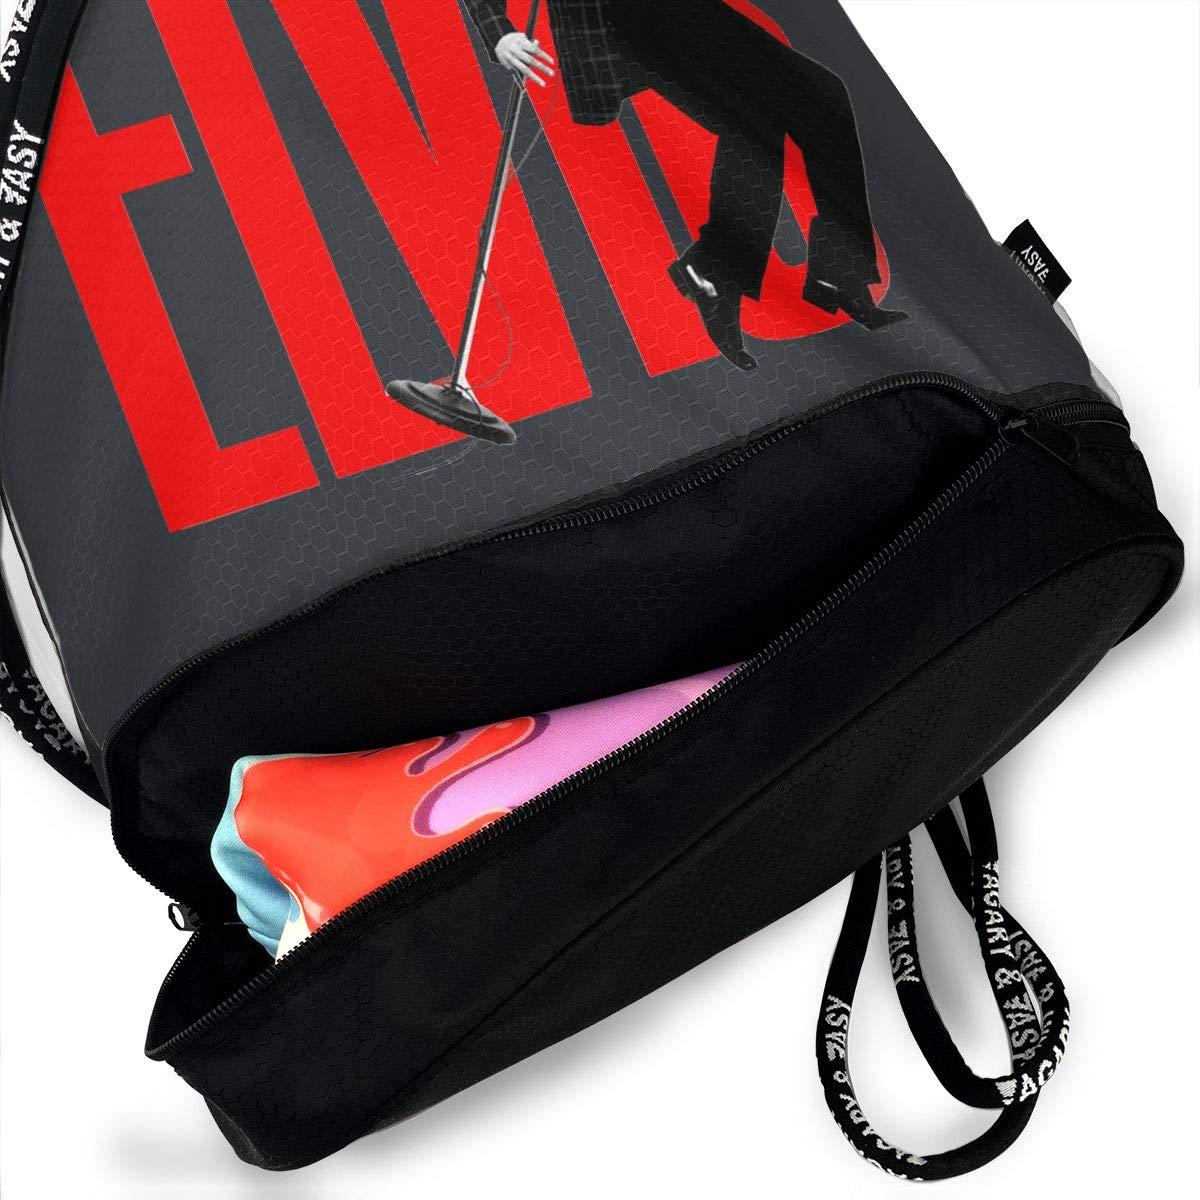 Model LGGG 9195 Sandover Netpack Soft Lightweight Day Pack 5 Colors Everyday Backpack NEW